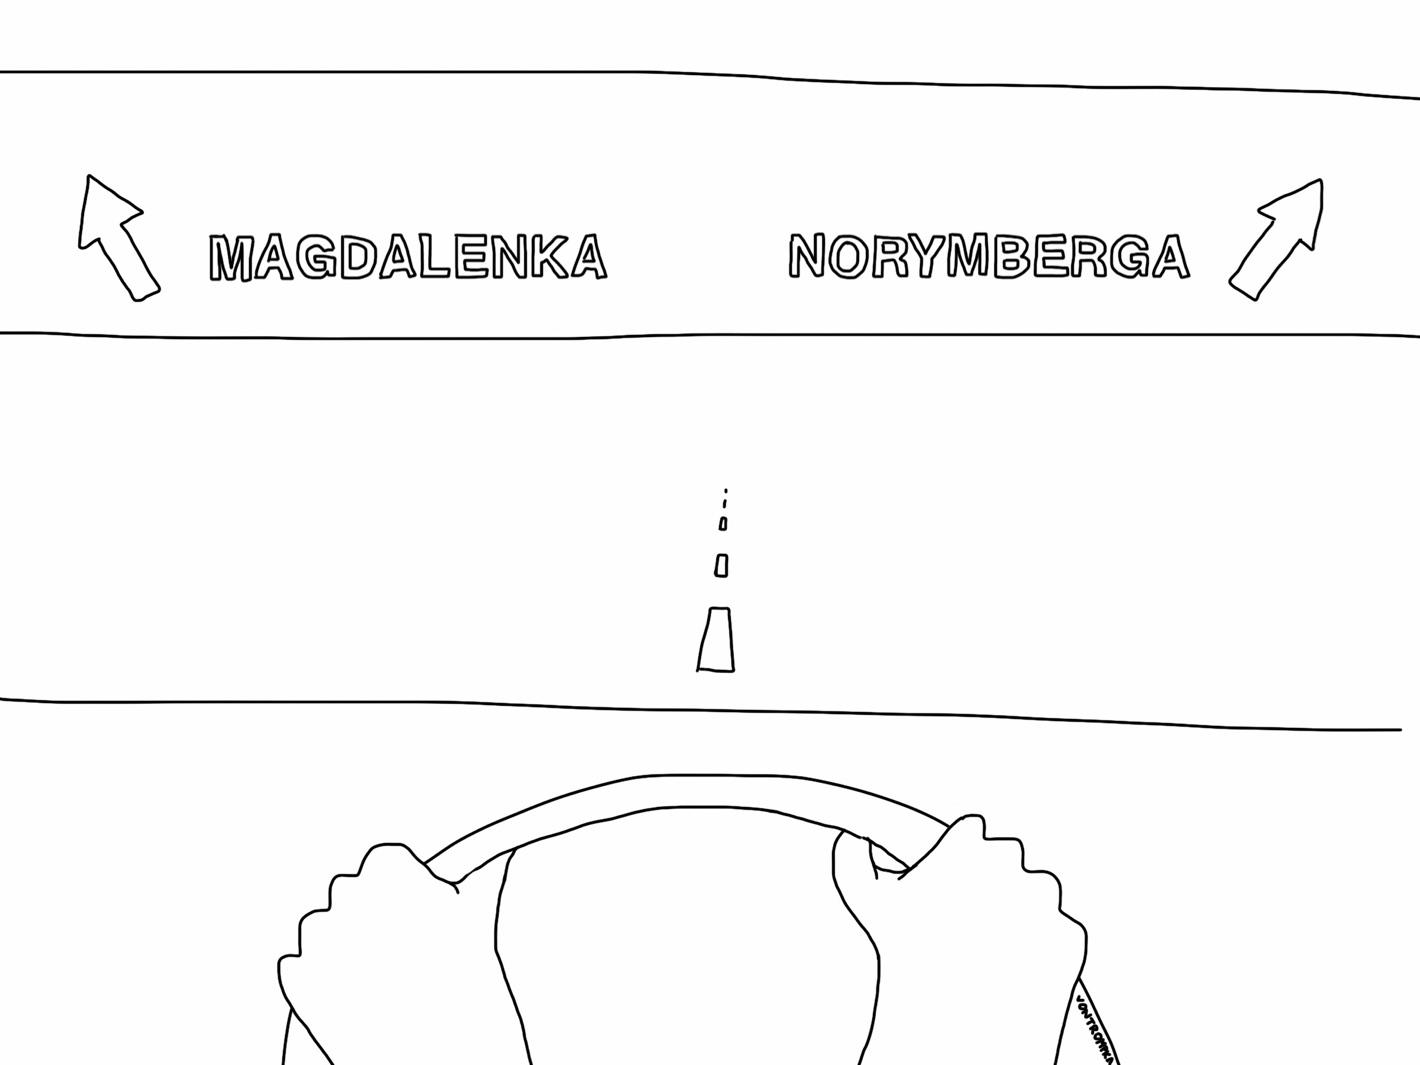 magdalenka norymberga